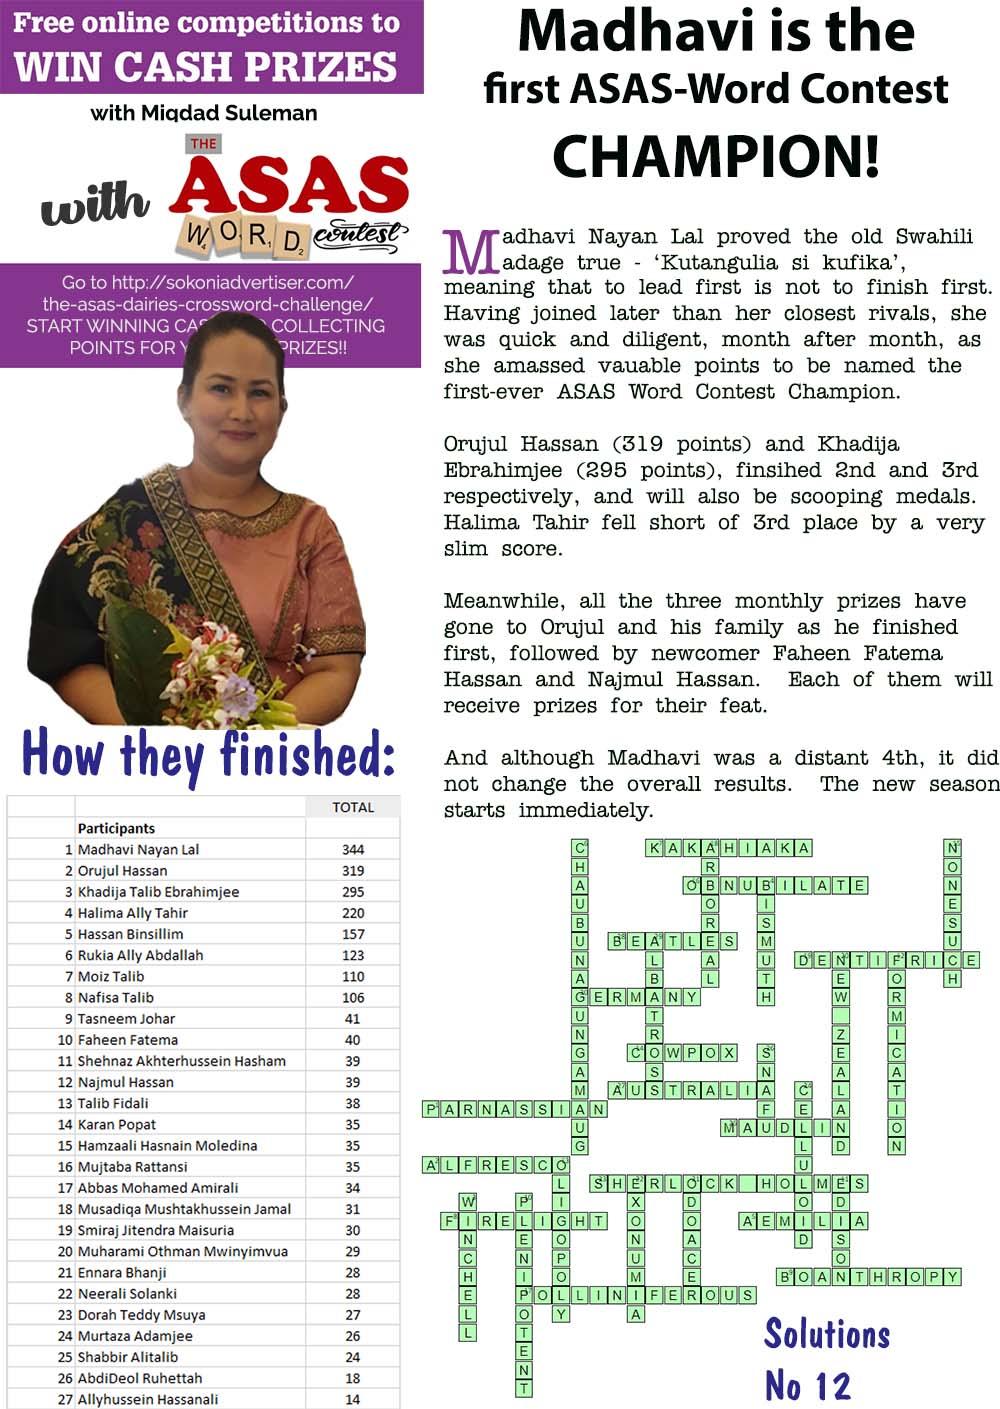 SokoniAdvertiser-Madhavi-is-the-first-ASAS-Word-Contest-Champion